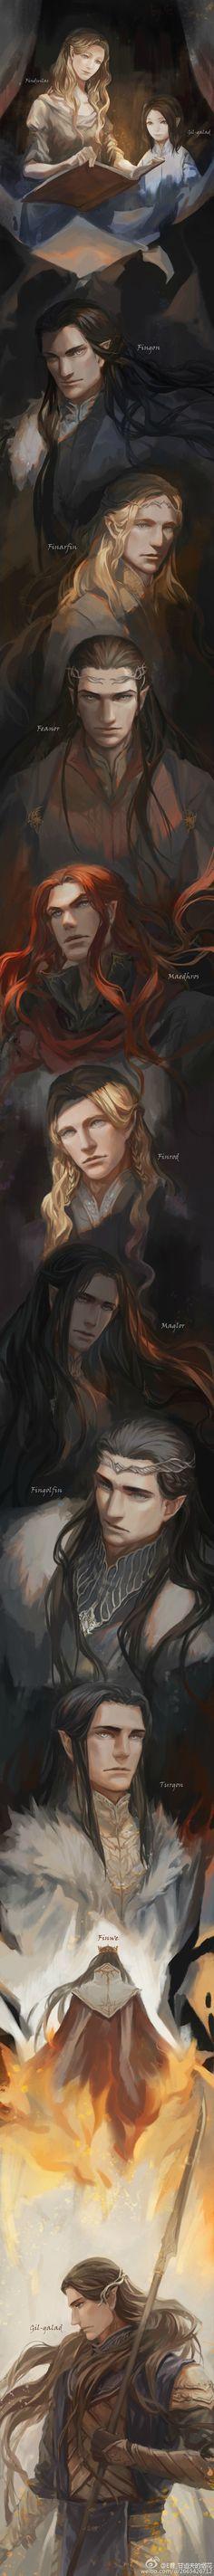 Finduilas, Gil-galad, Fingon, Finarfin, Fëanor, Maedhros, Finrod, Maglor, Fingolfin, Turgon, Finwë and Gil-galad